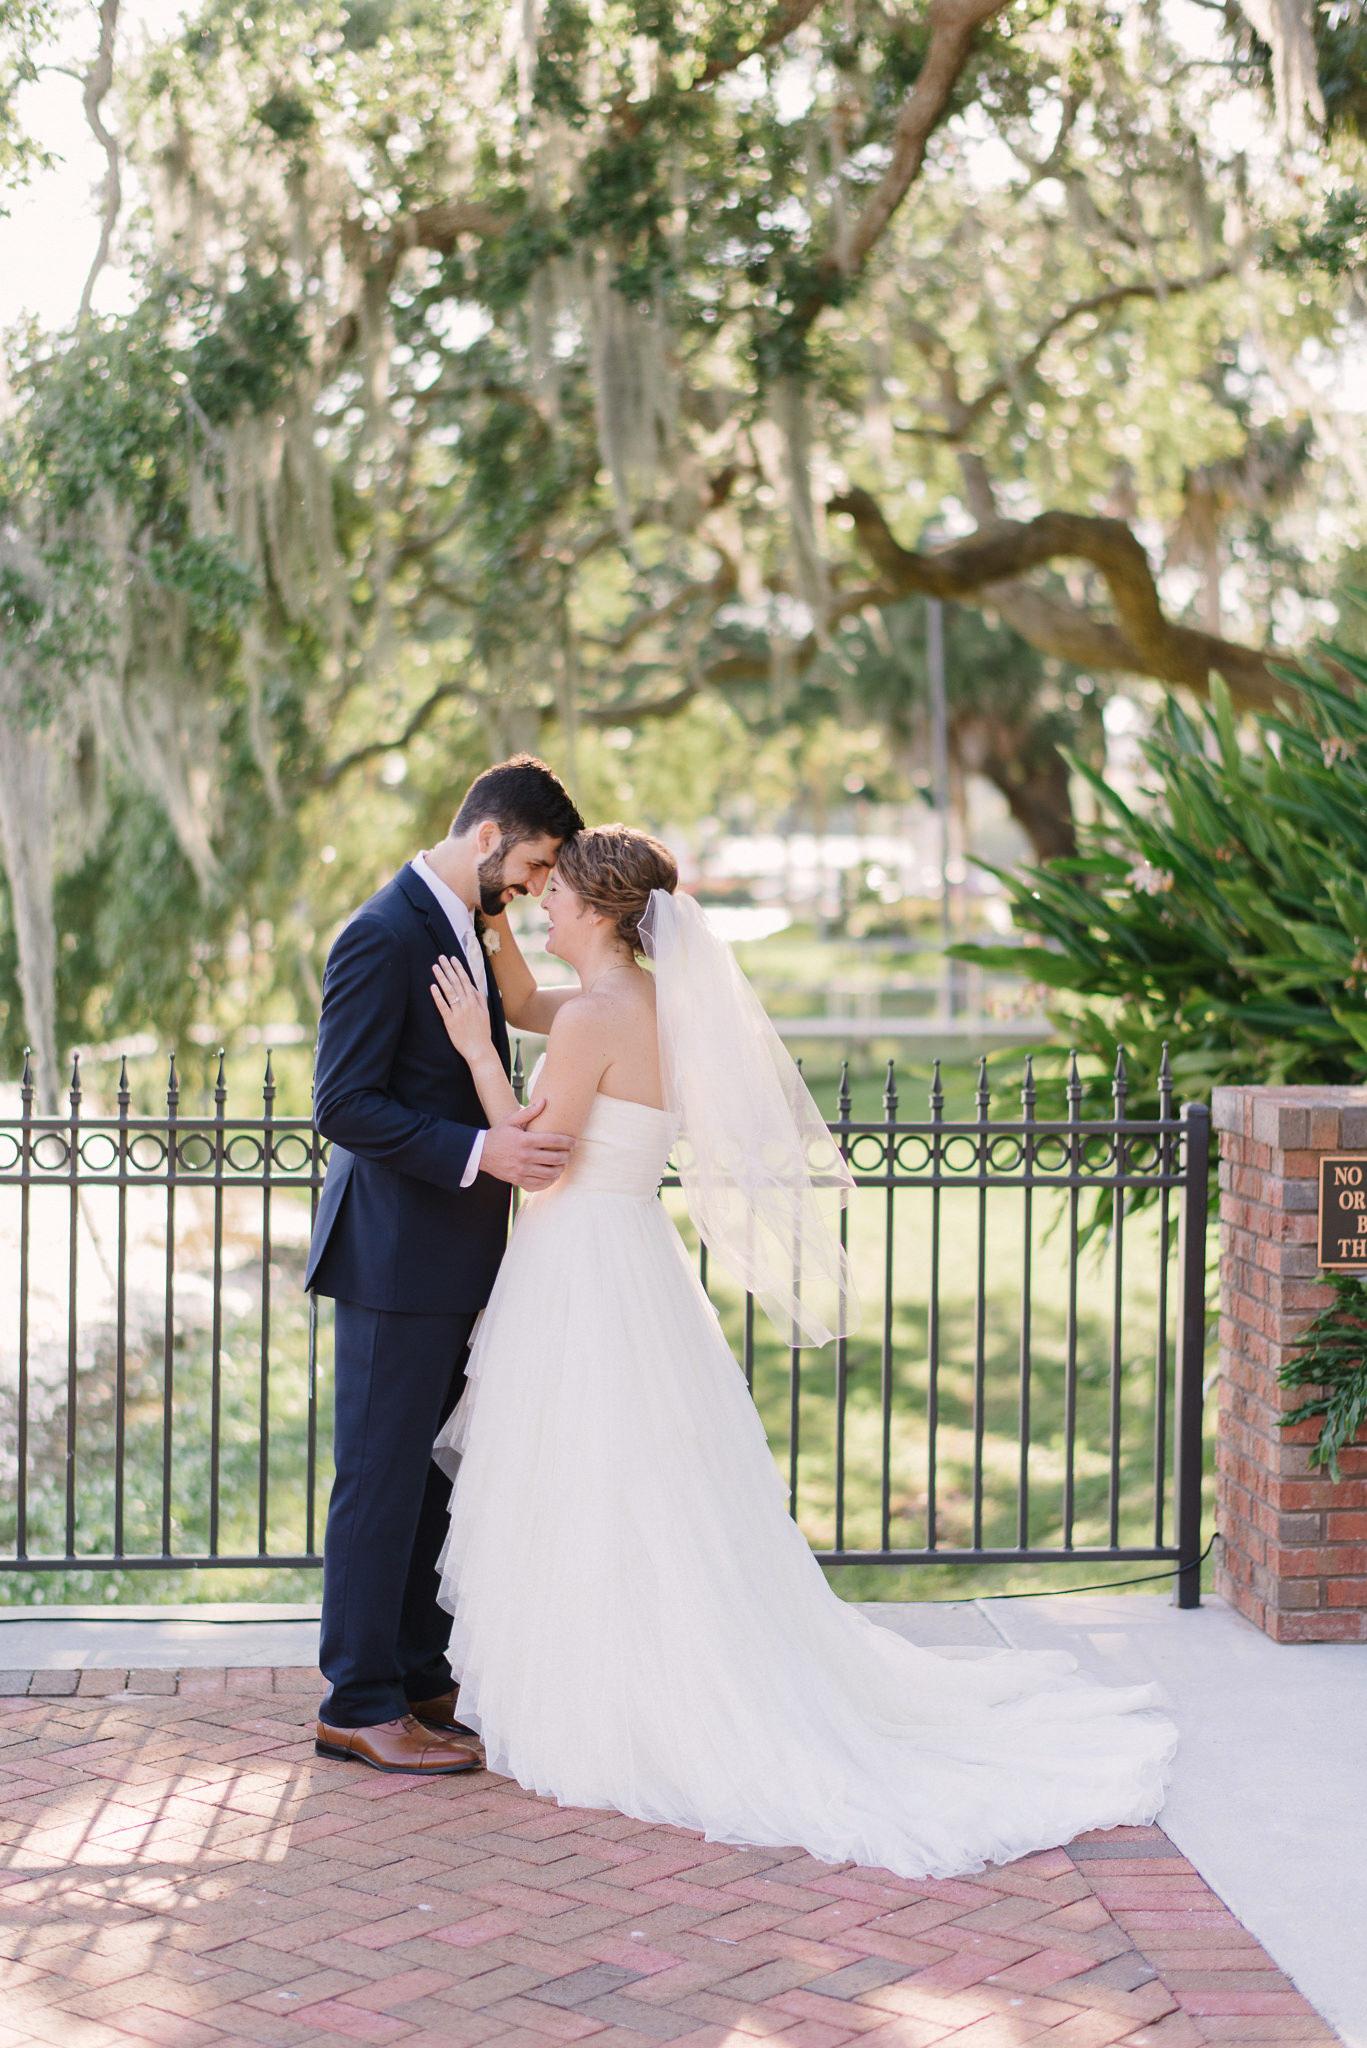 Tavares+Pavilion+on+the+Lake+Wedding+Florida_026.jpg